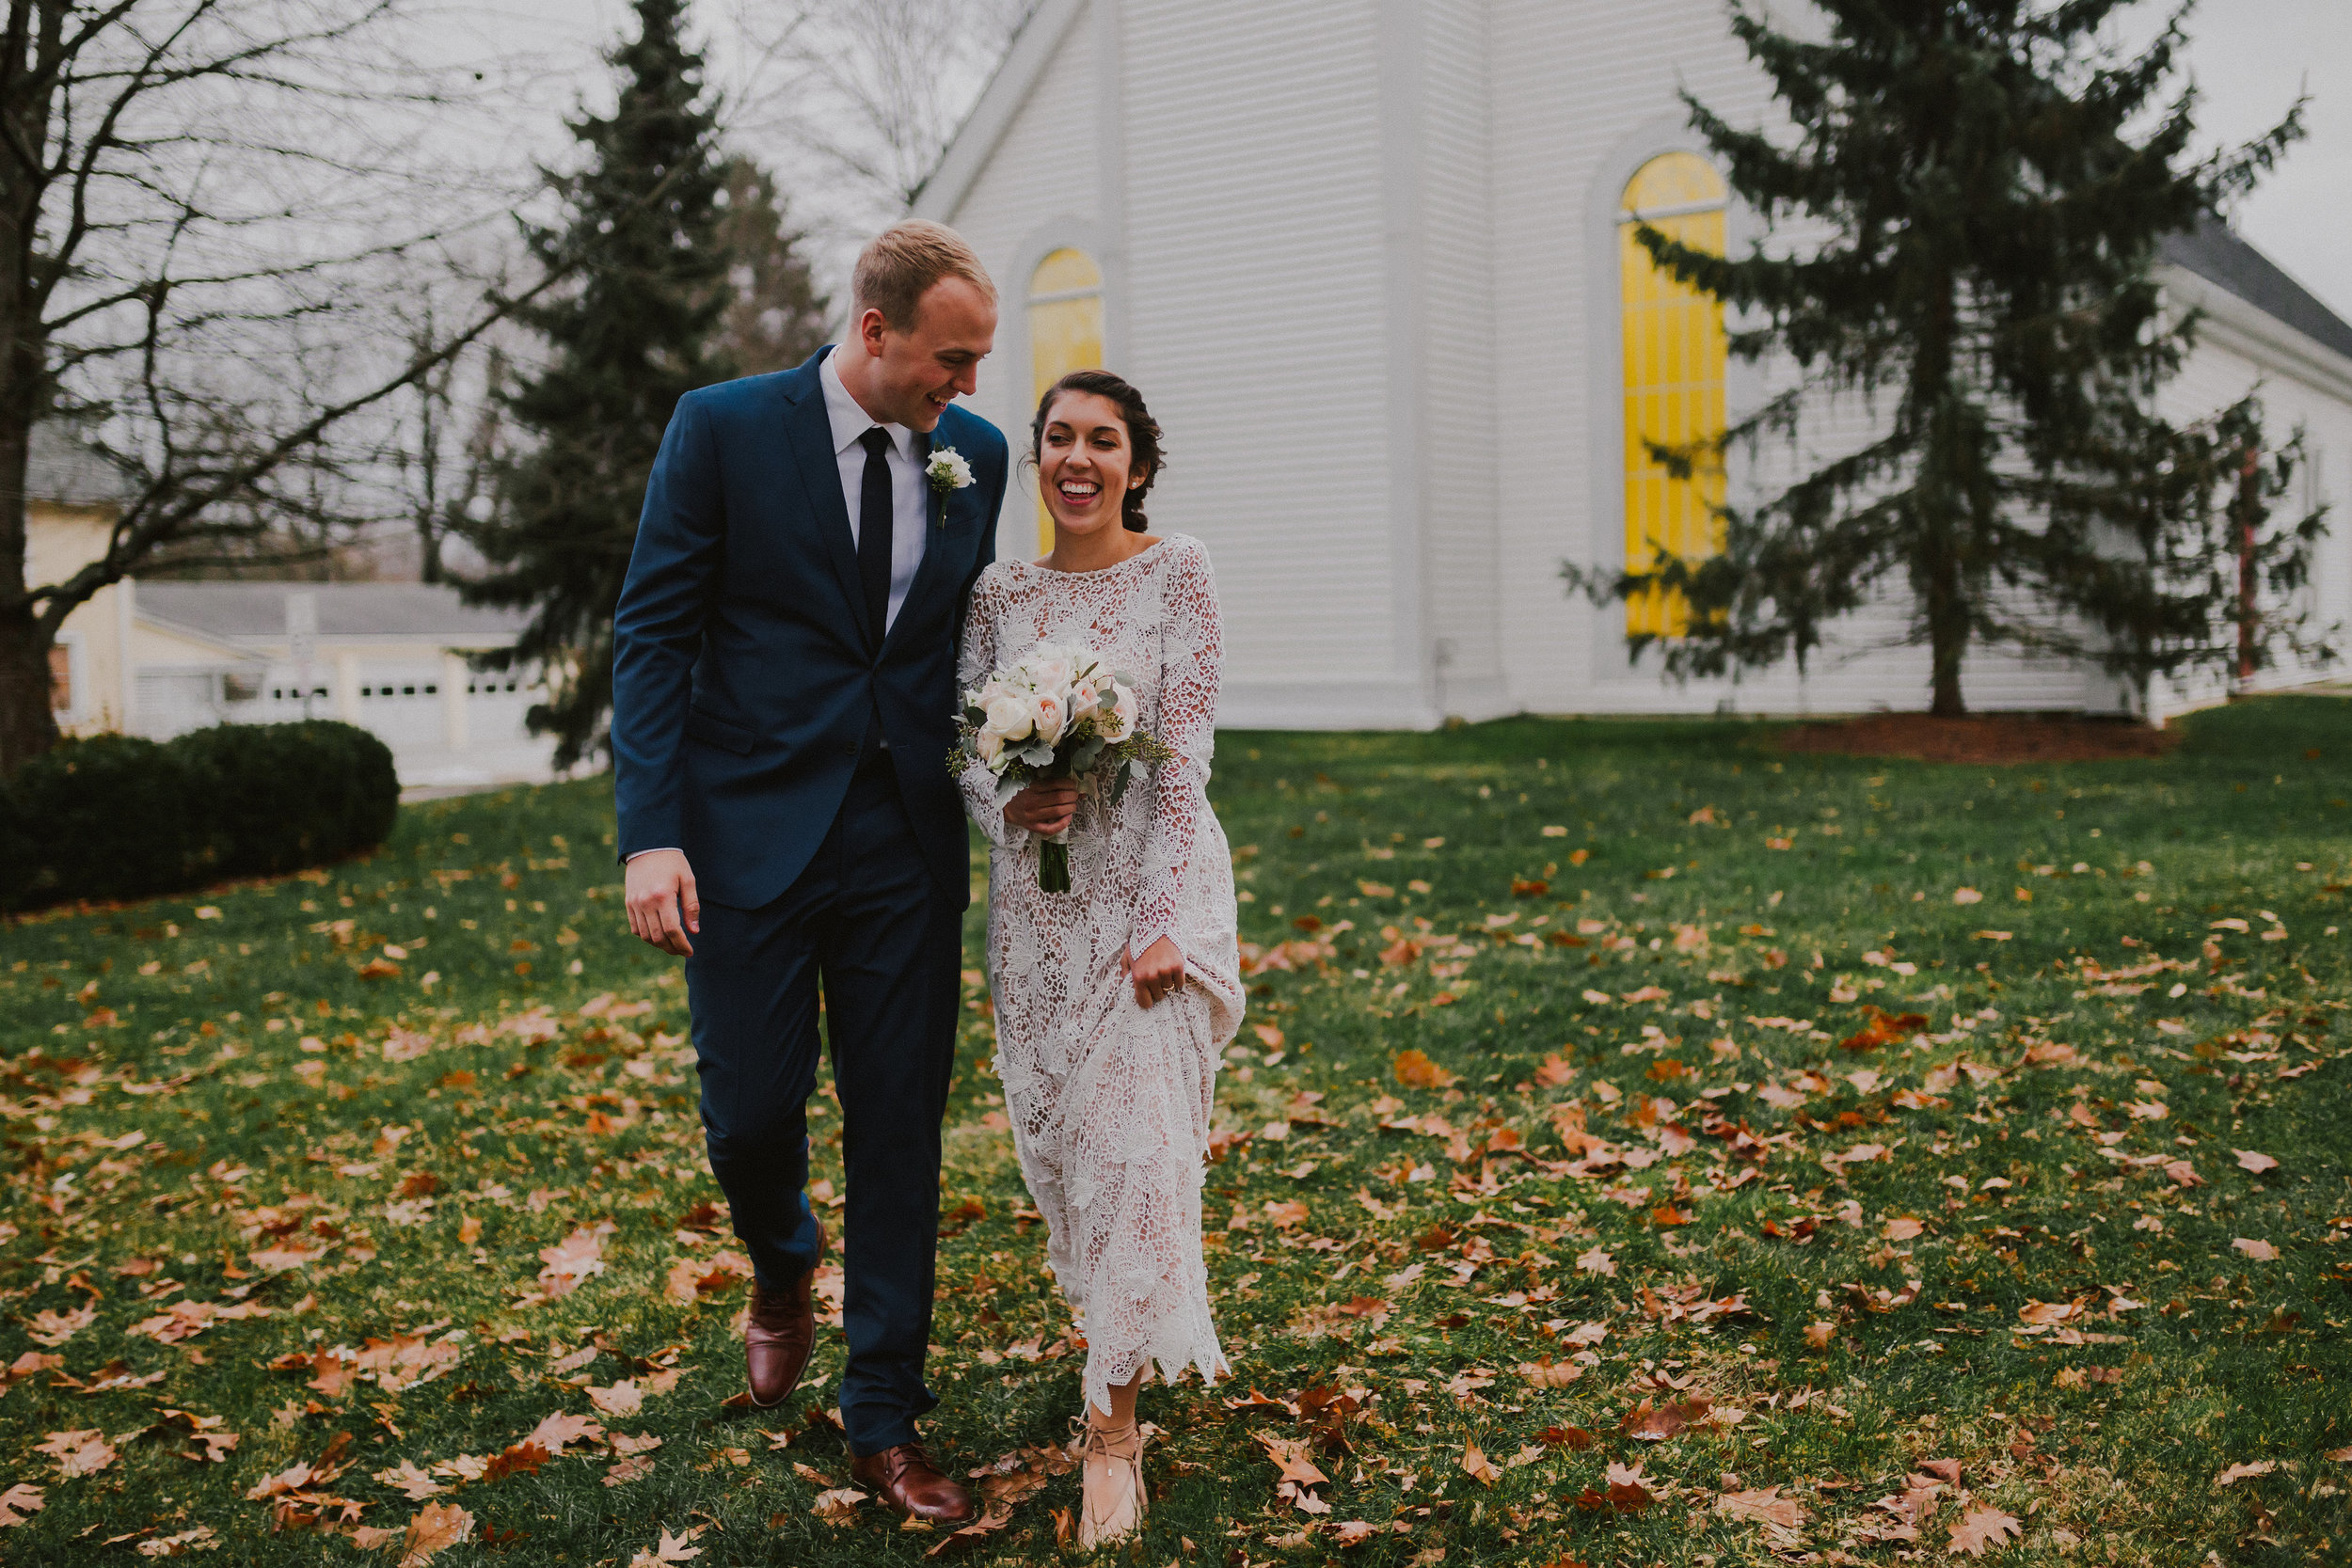 ALLD_shaffer_wedding-232.JPG